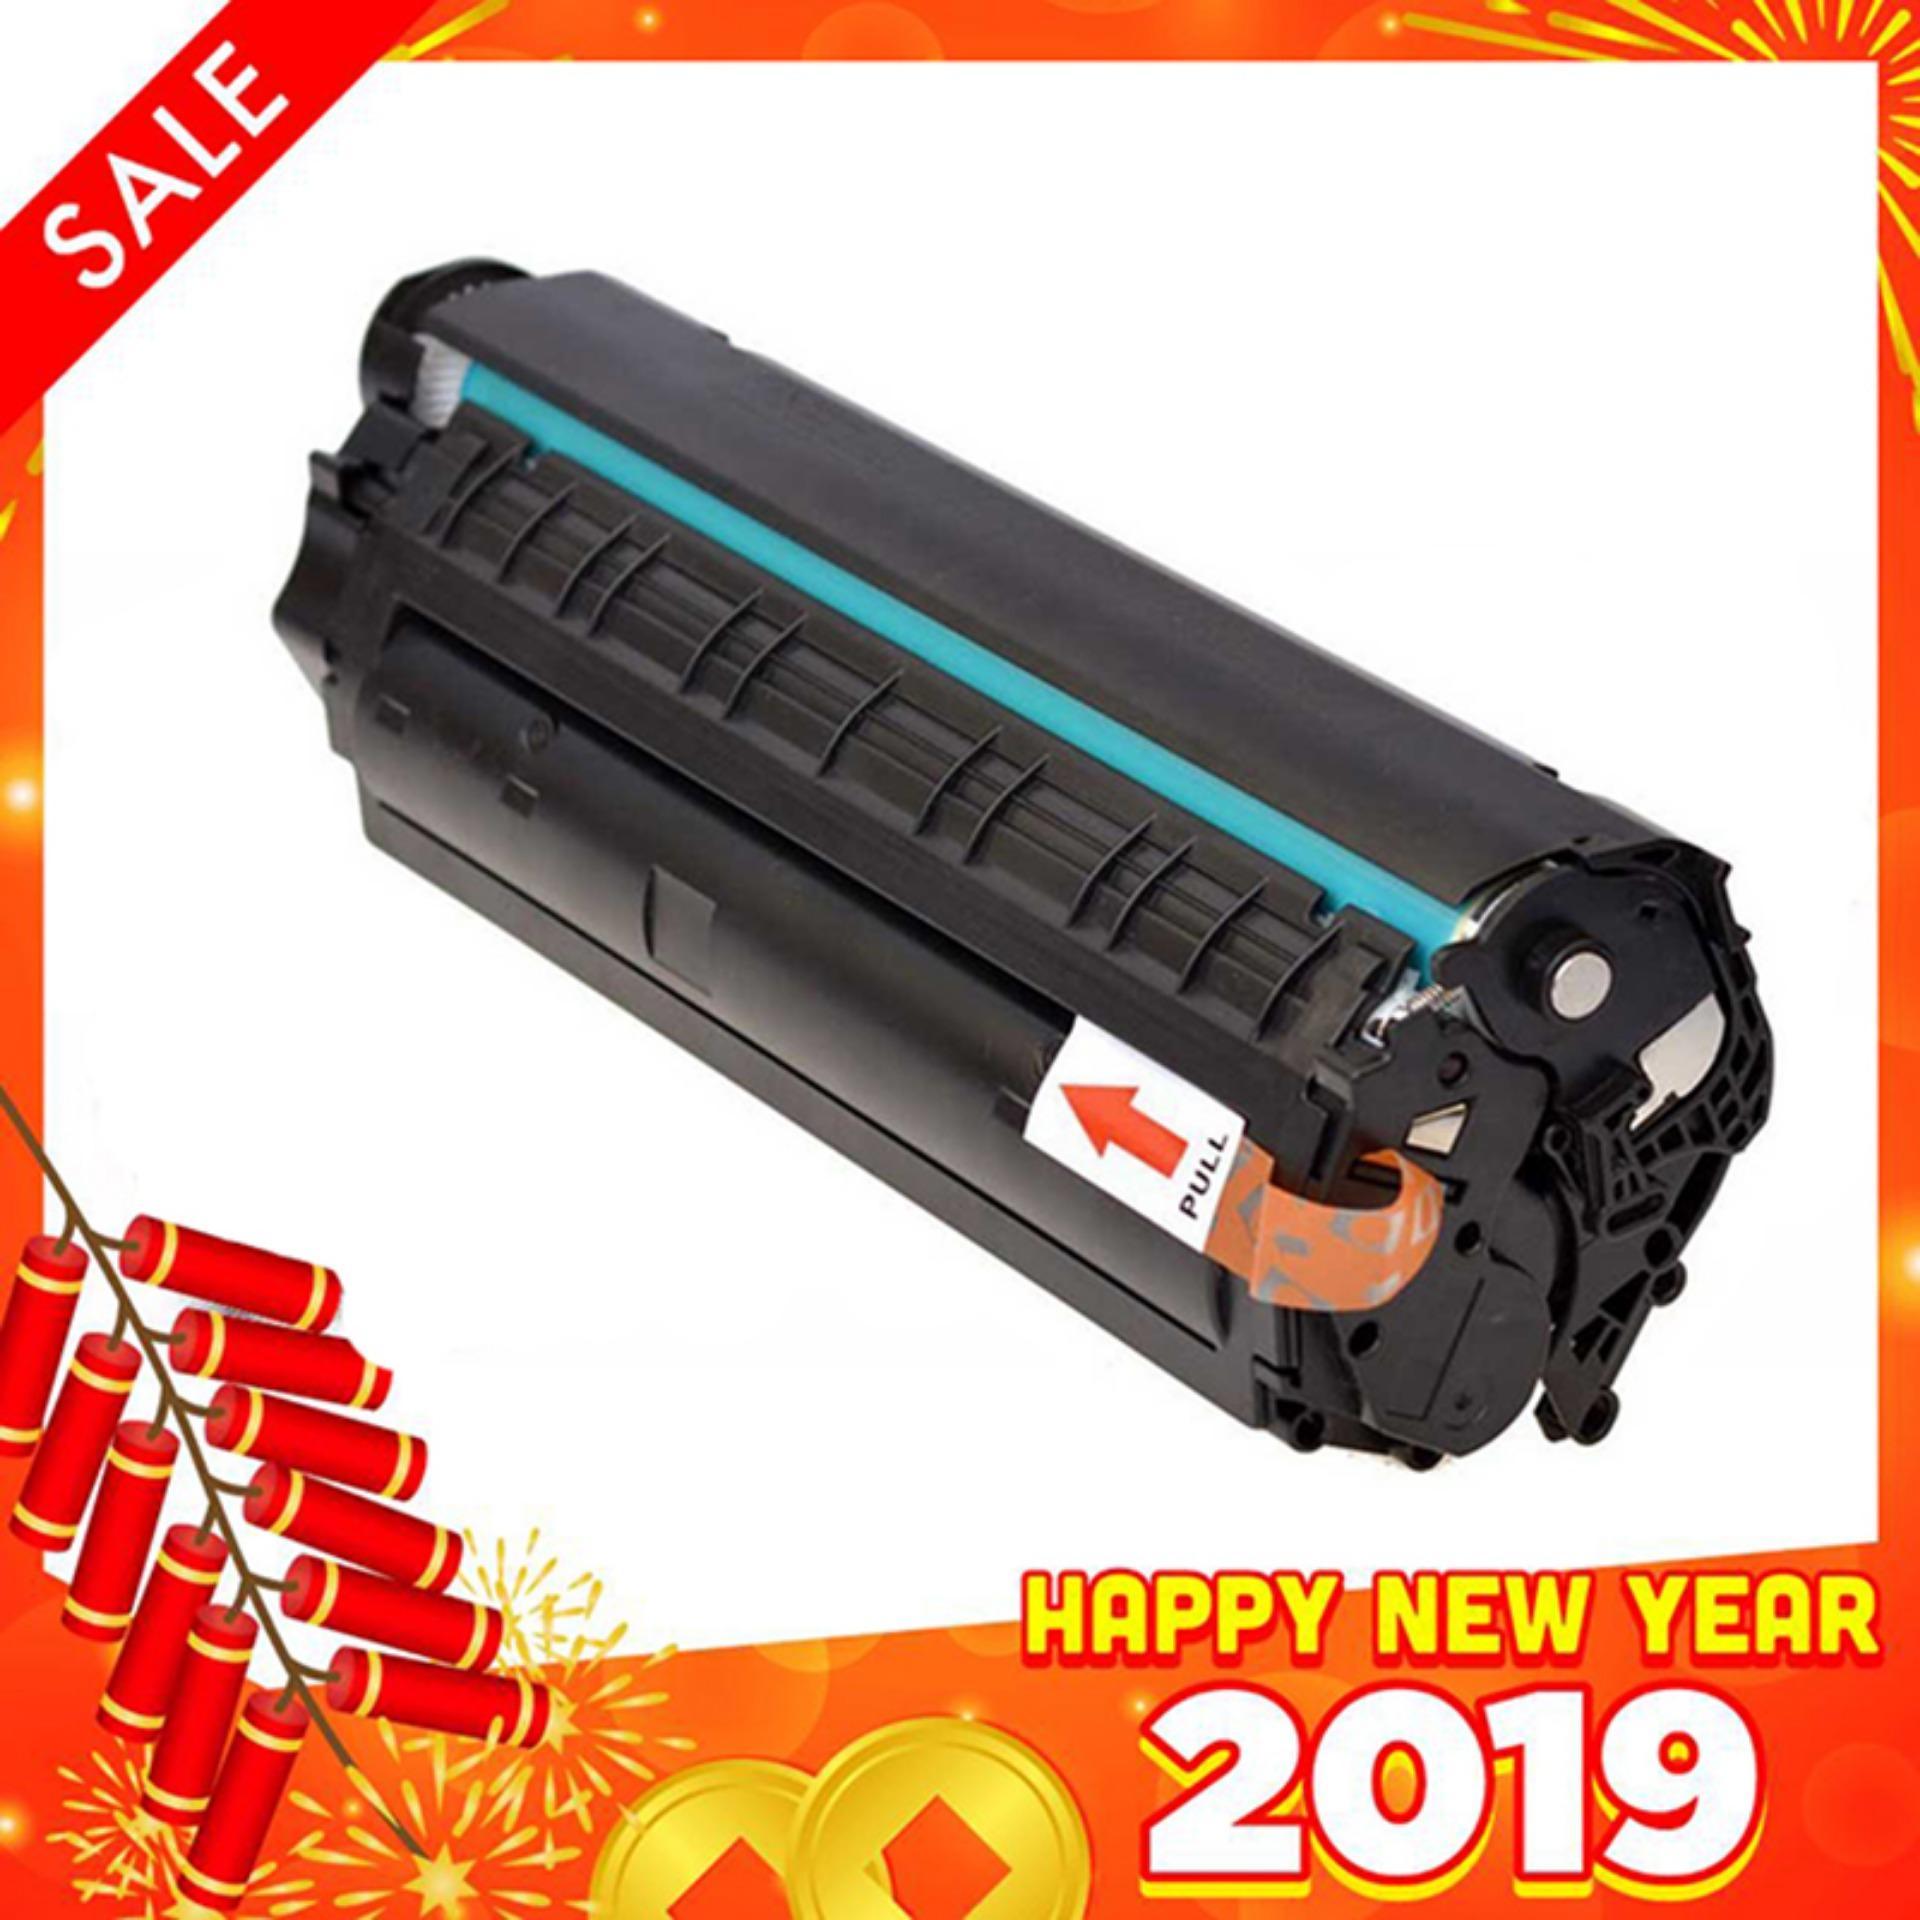 Hộp mực HP LaserJet 1020 (Catridge 12A-303 - Đen) Nhật Bản